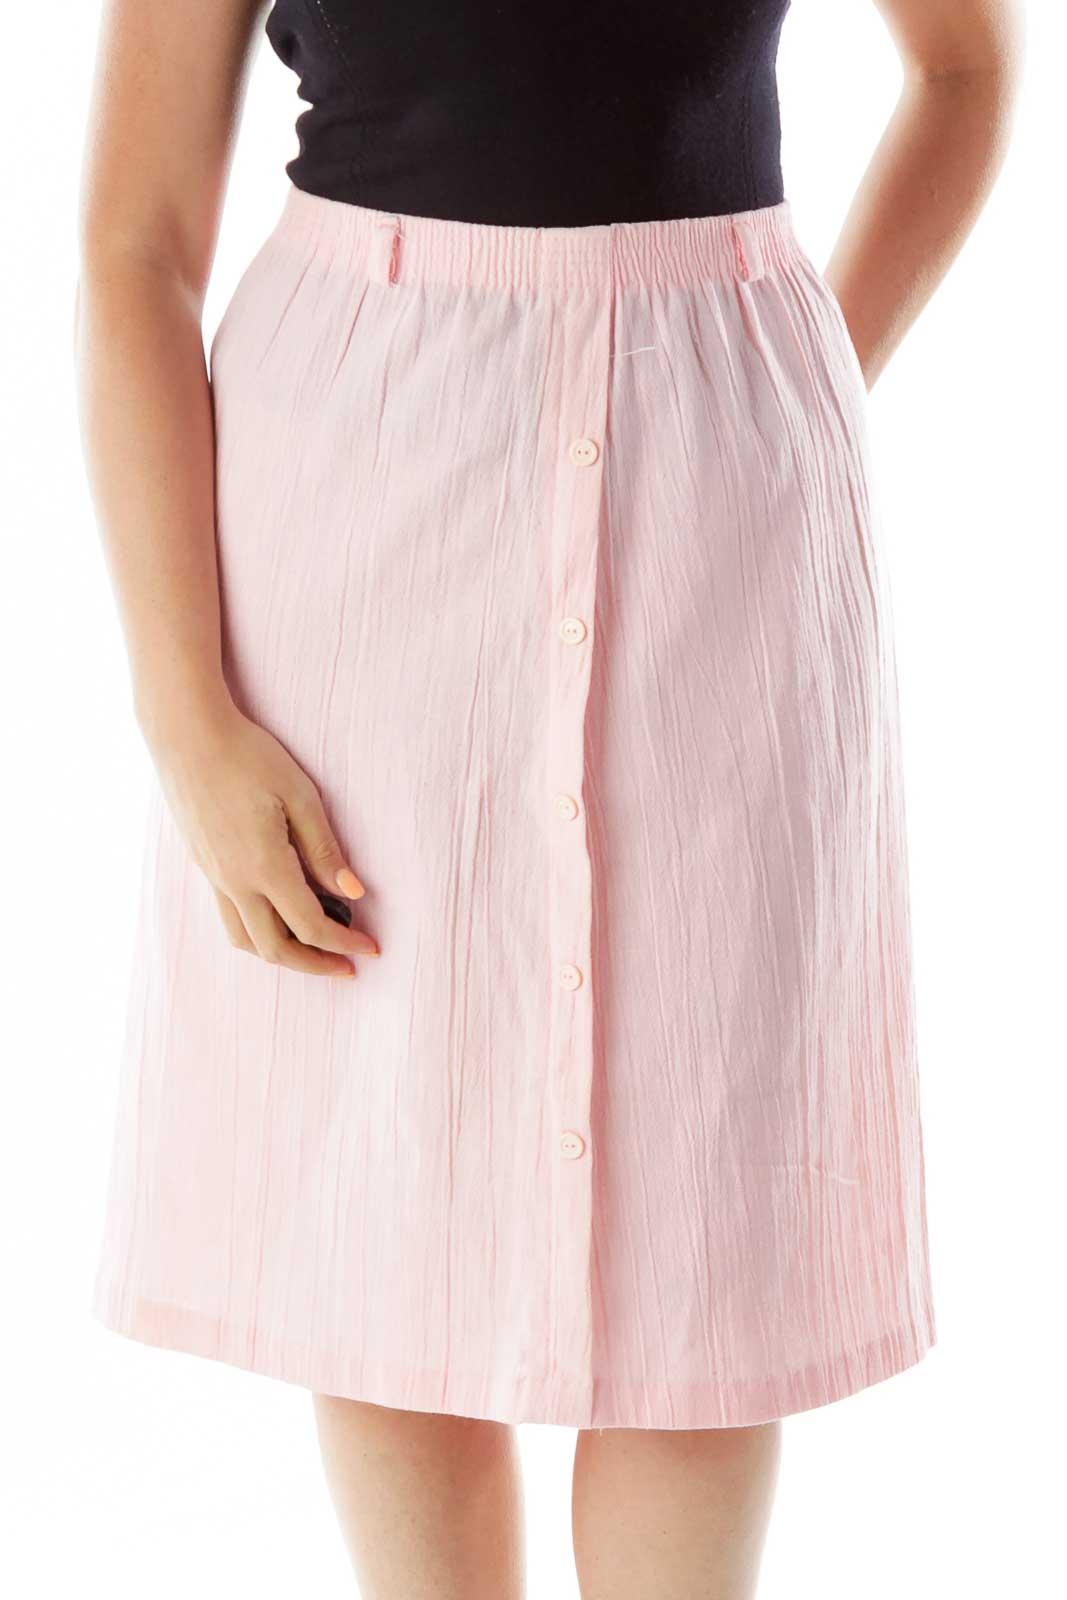 Pink Flared Knee Length Skirt Front